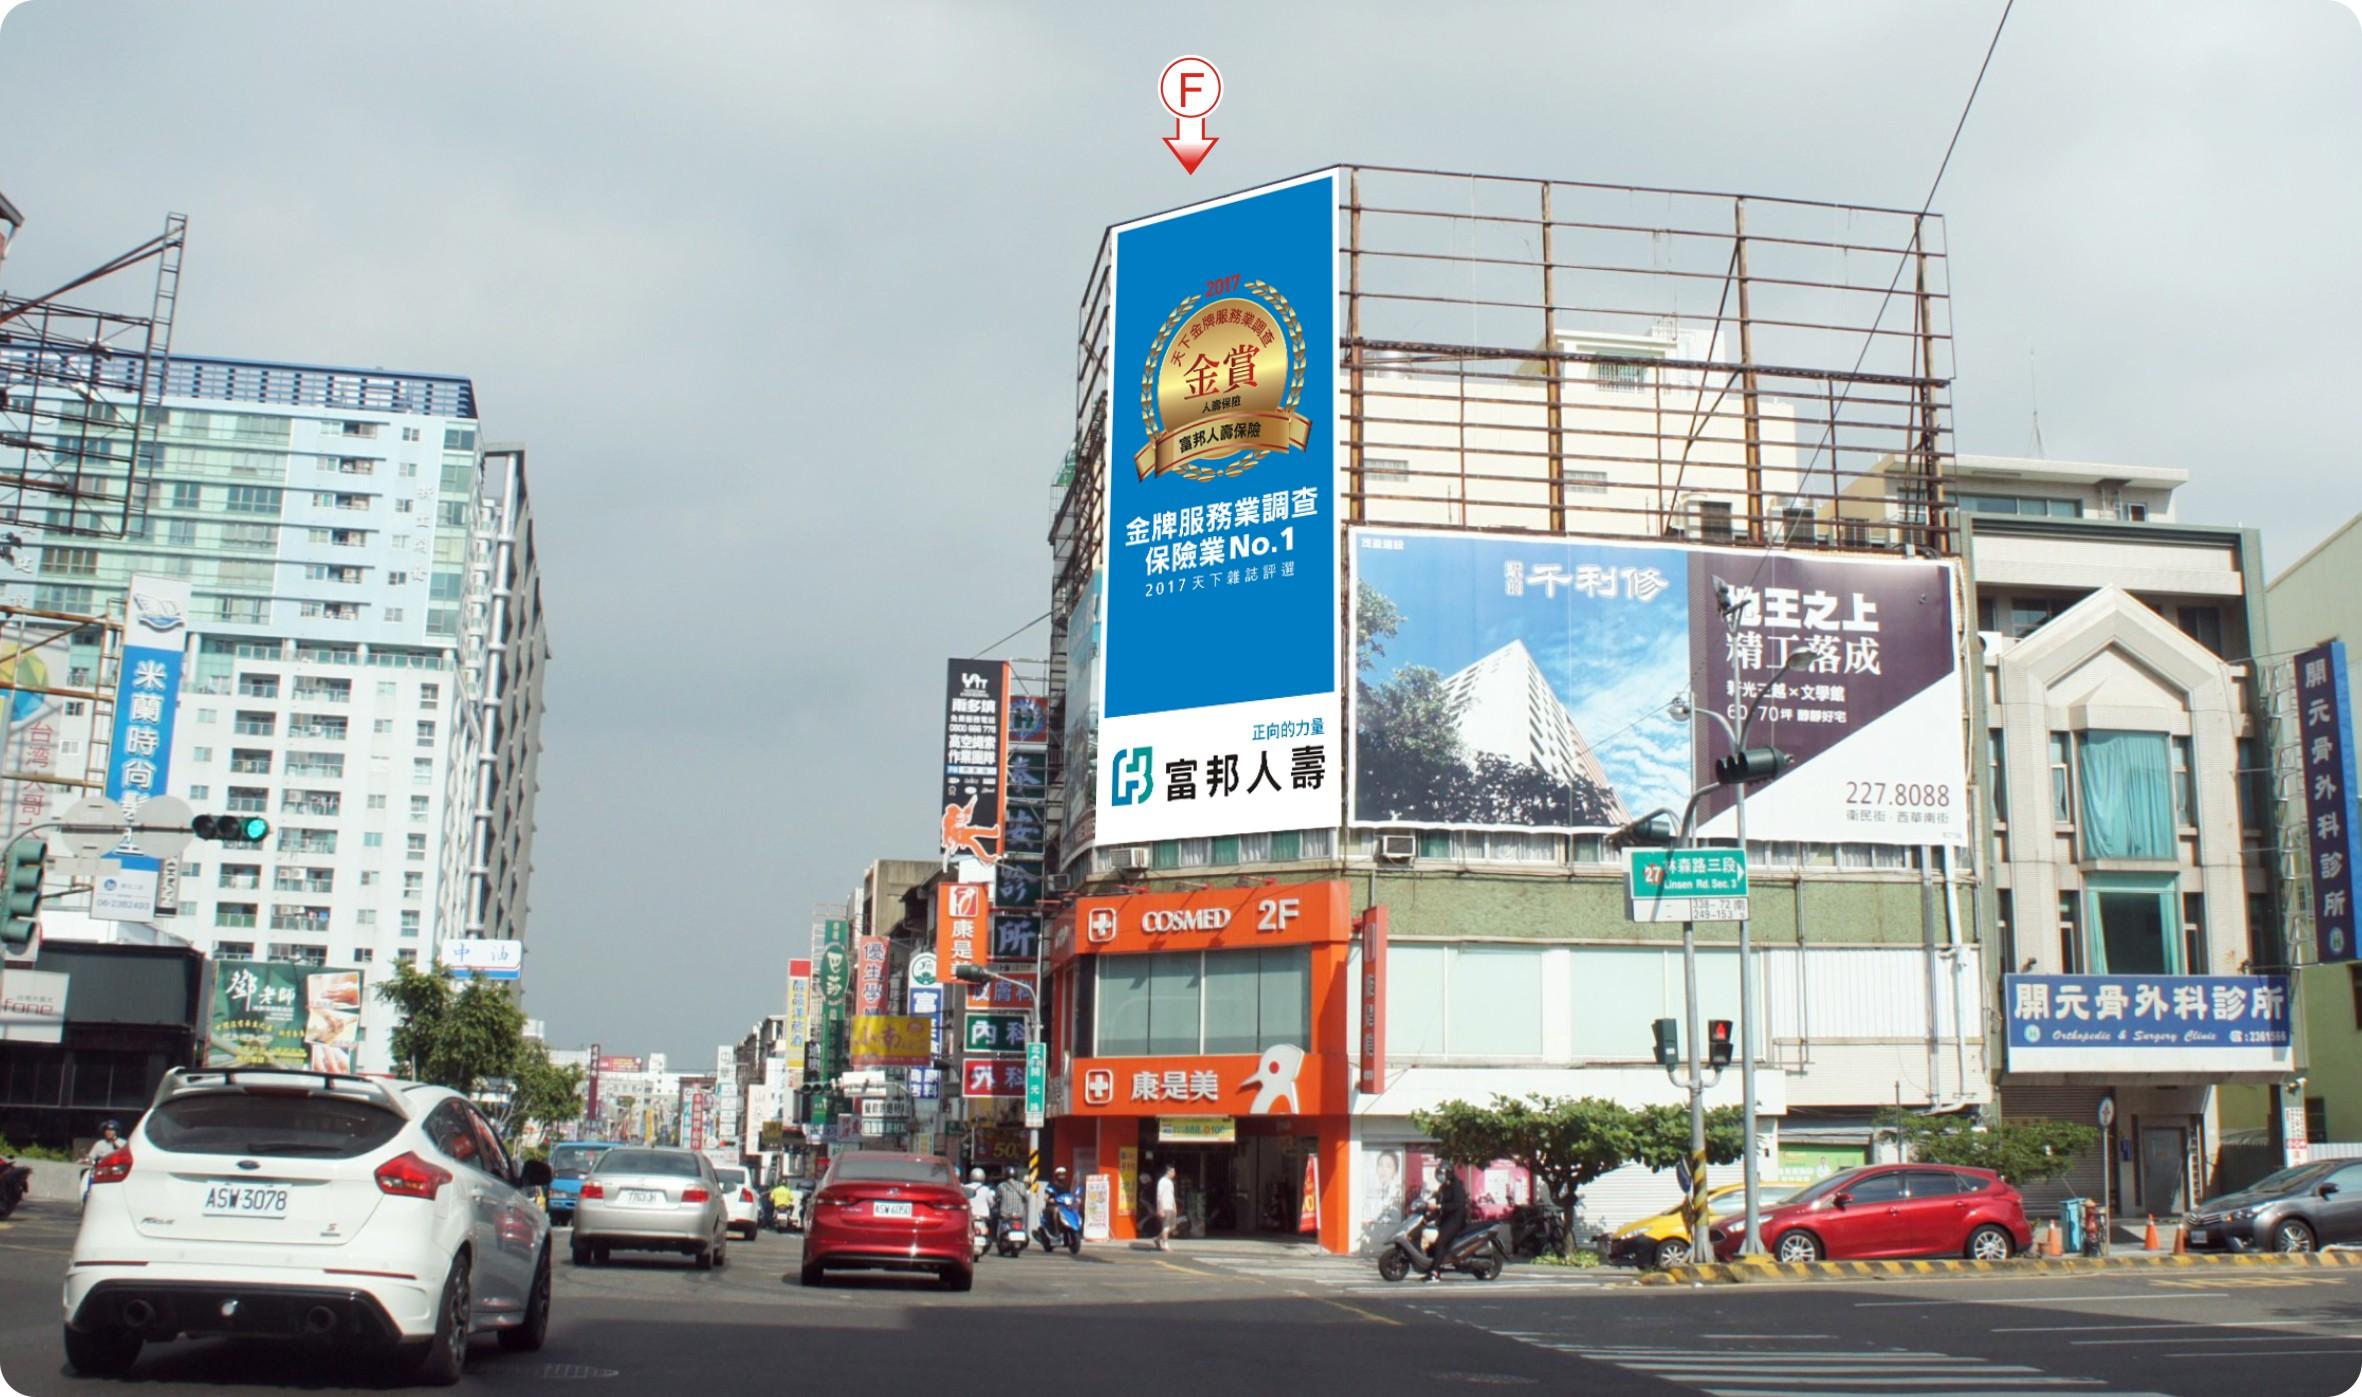 N-0782F-開元路往永康方向、健身工廠、小吃商圈